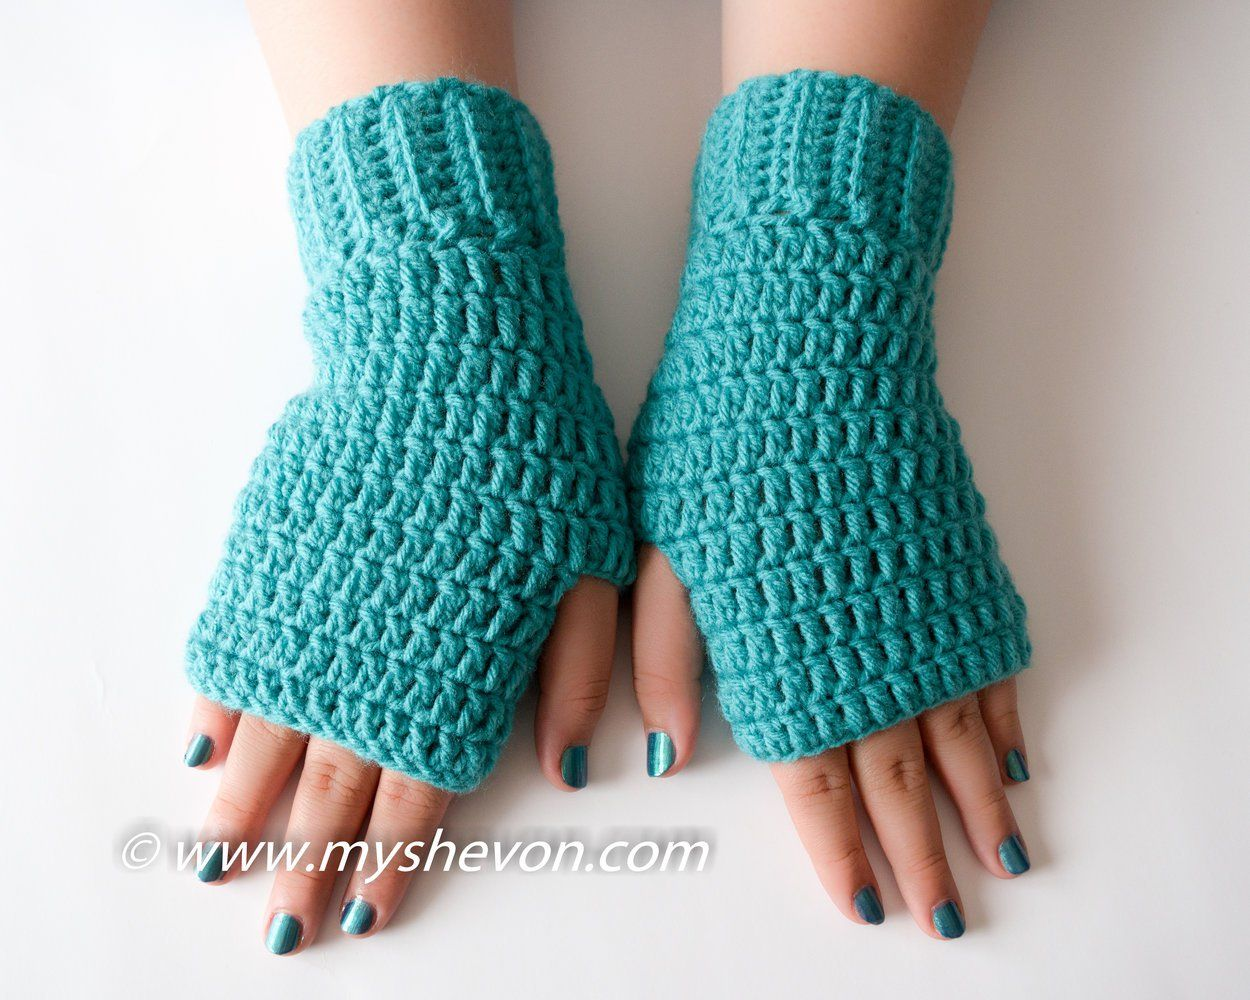 Free Easy Fingerless Gloves Pattern by www.myshevon.com | Crochet ...